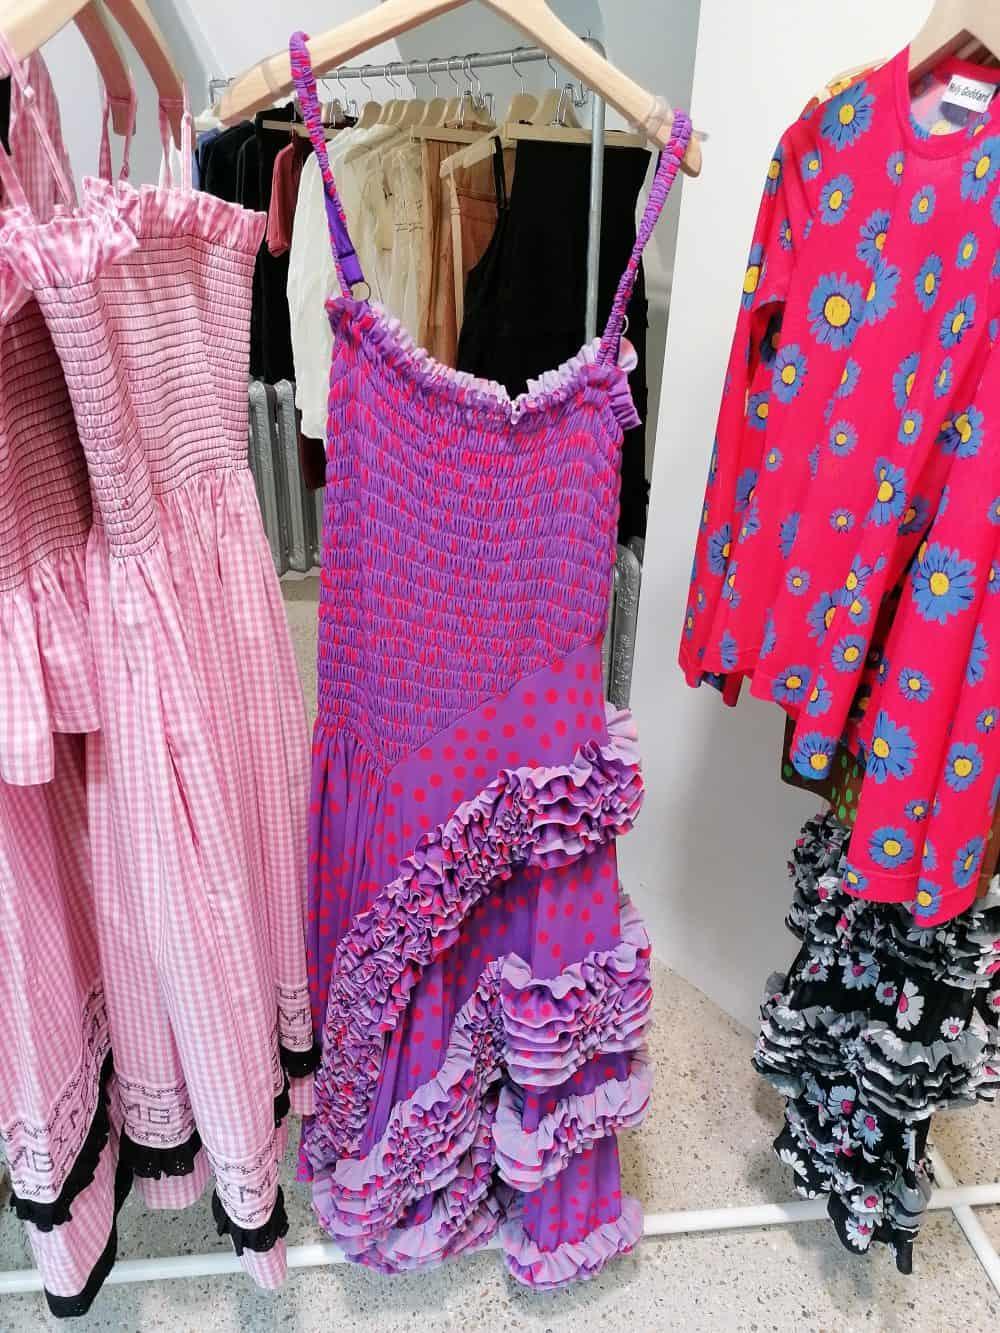 dresses by fashion designer Molly Goddard, Dover Street Market, Latest in Design Tour, Fashion Tours London